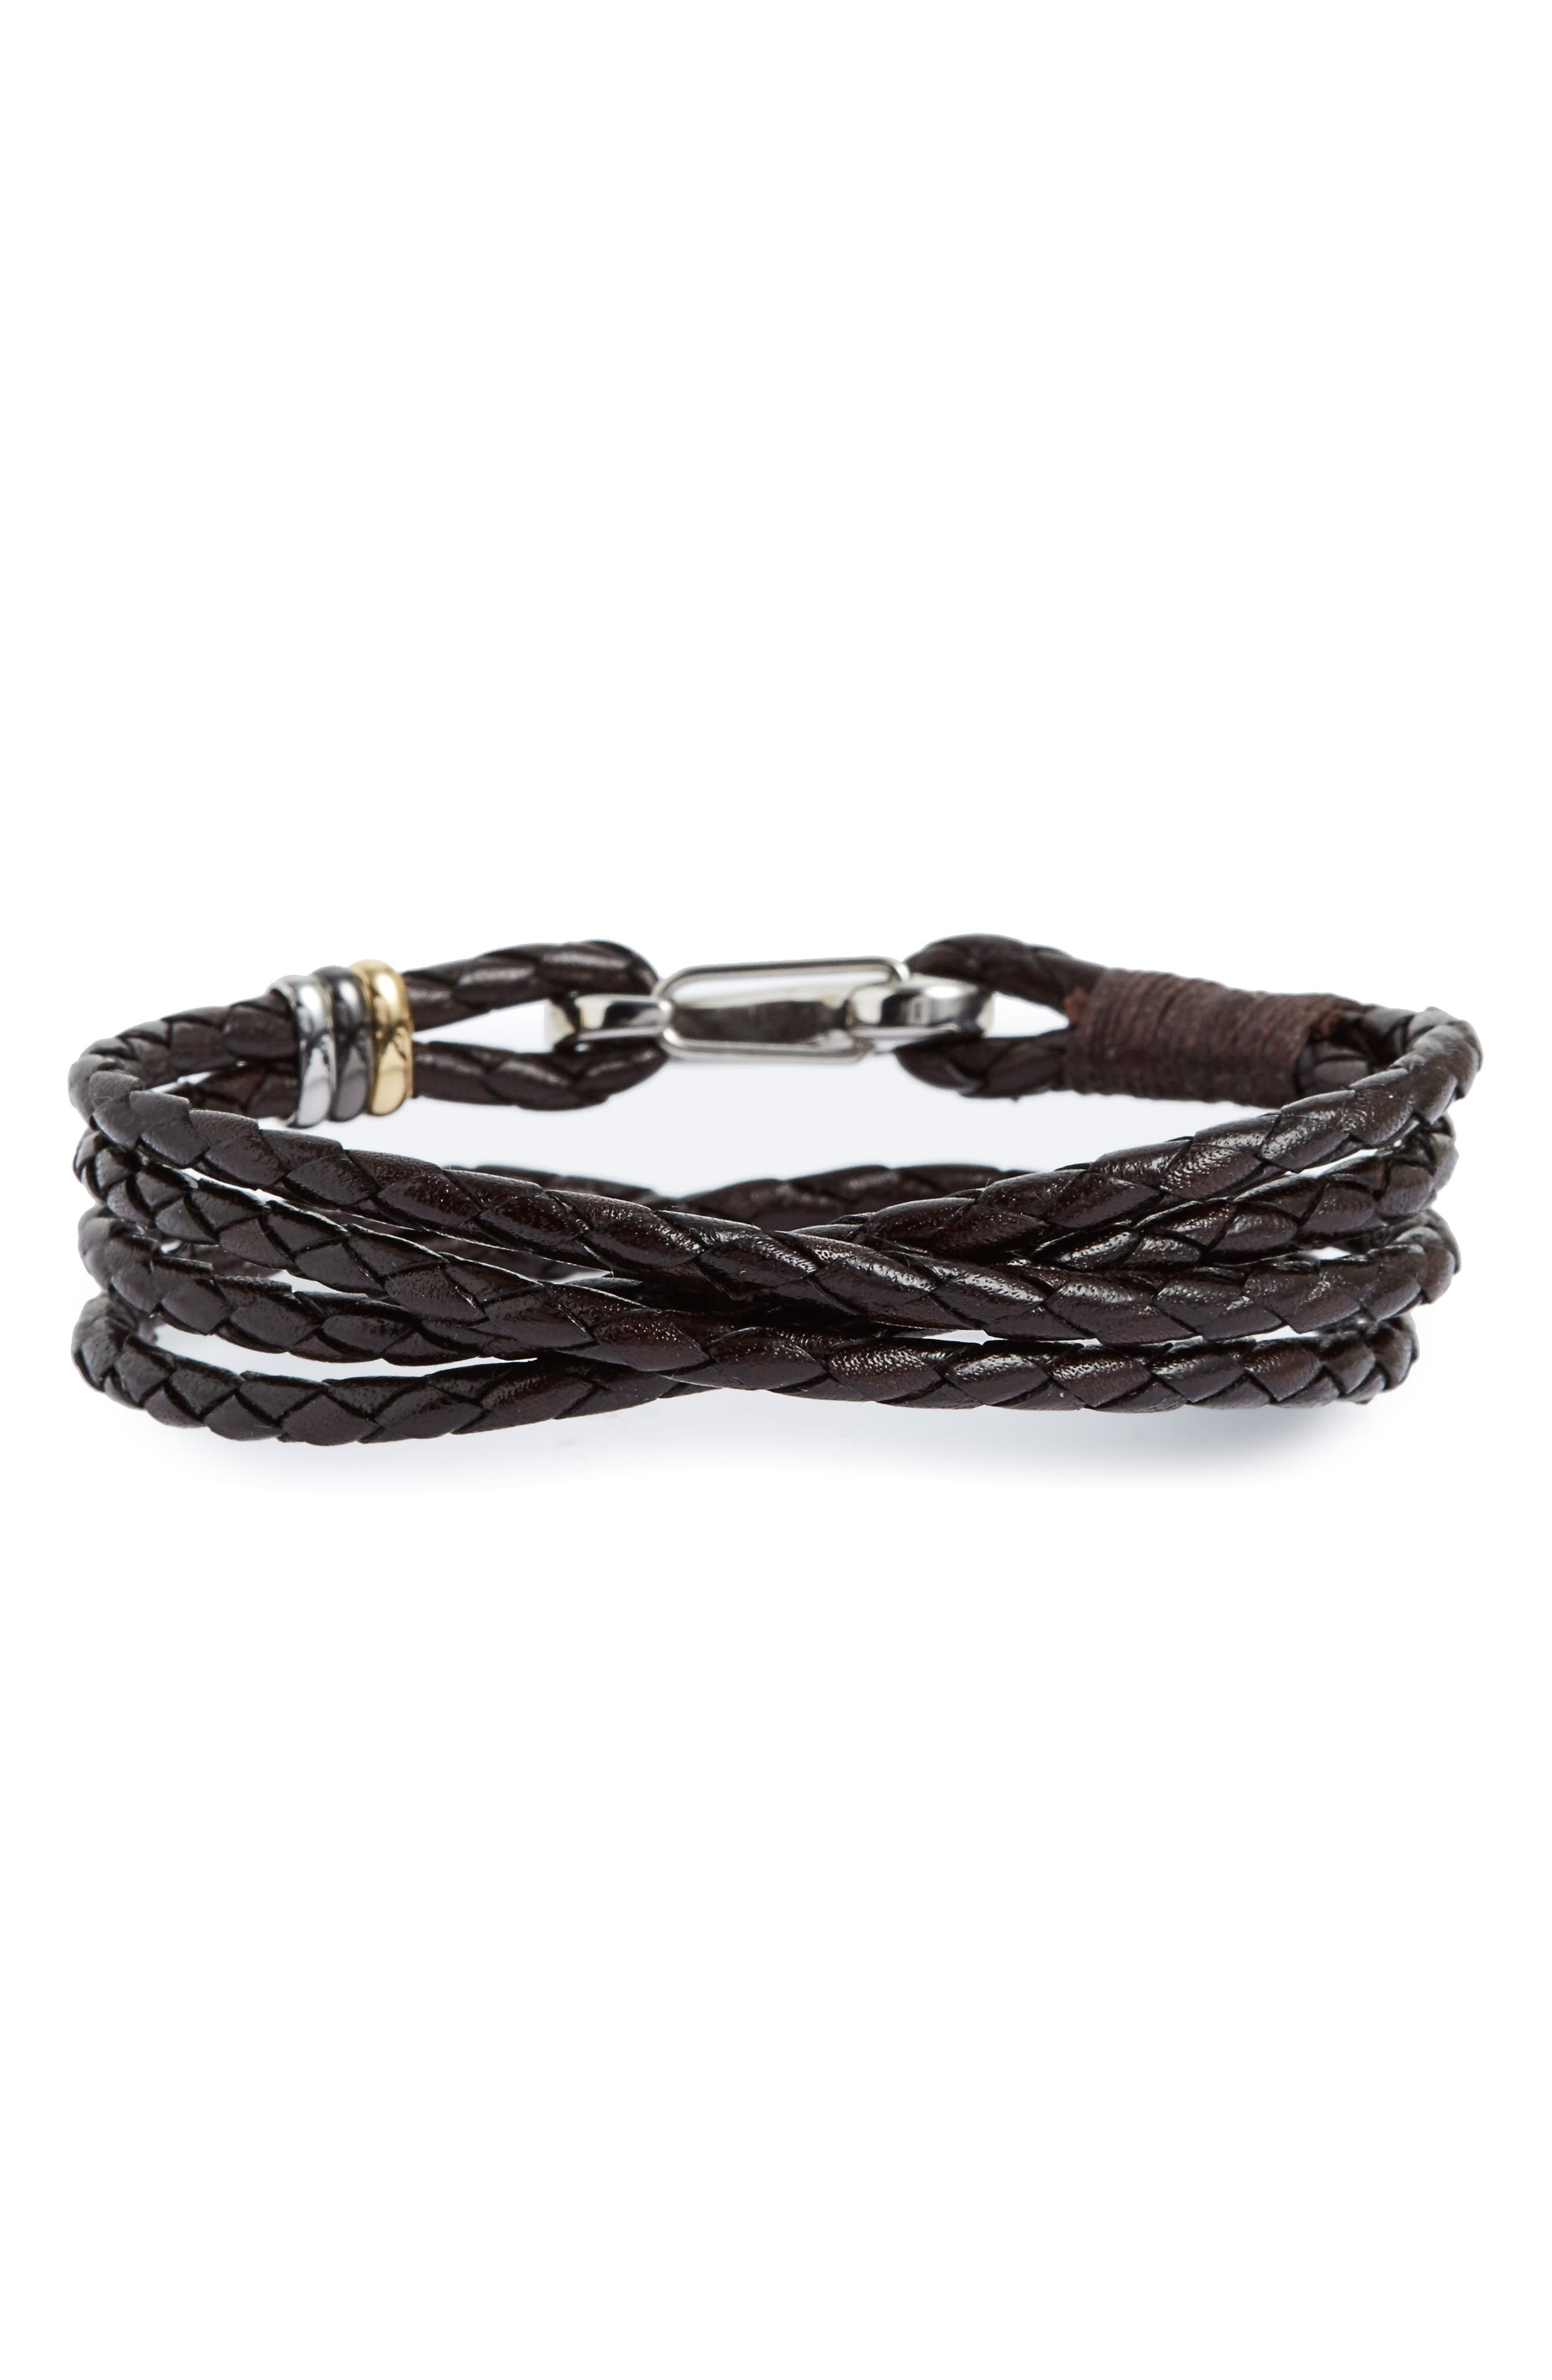 Braided Leather Wrap Bracelet,                             Main thumbnail 1, color,